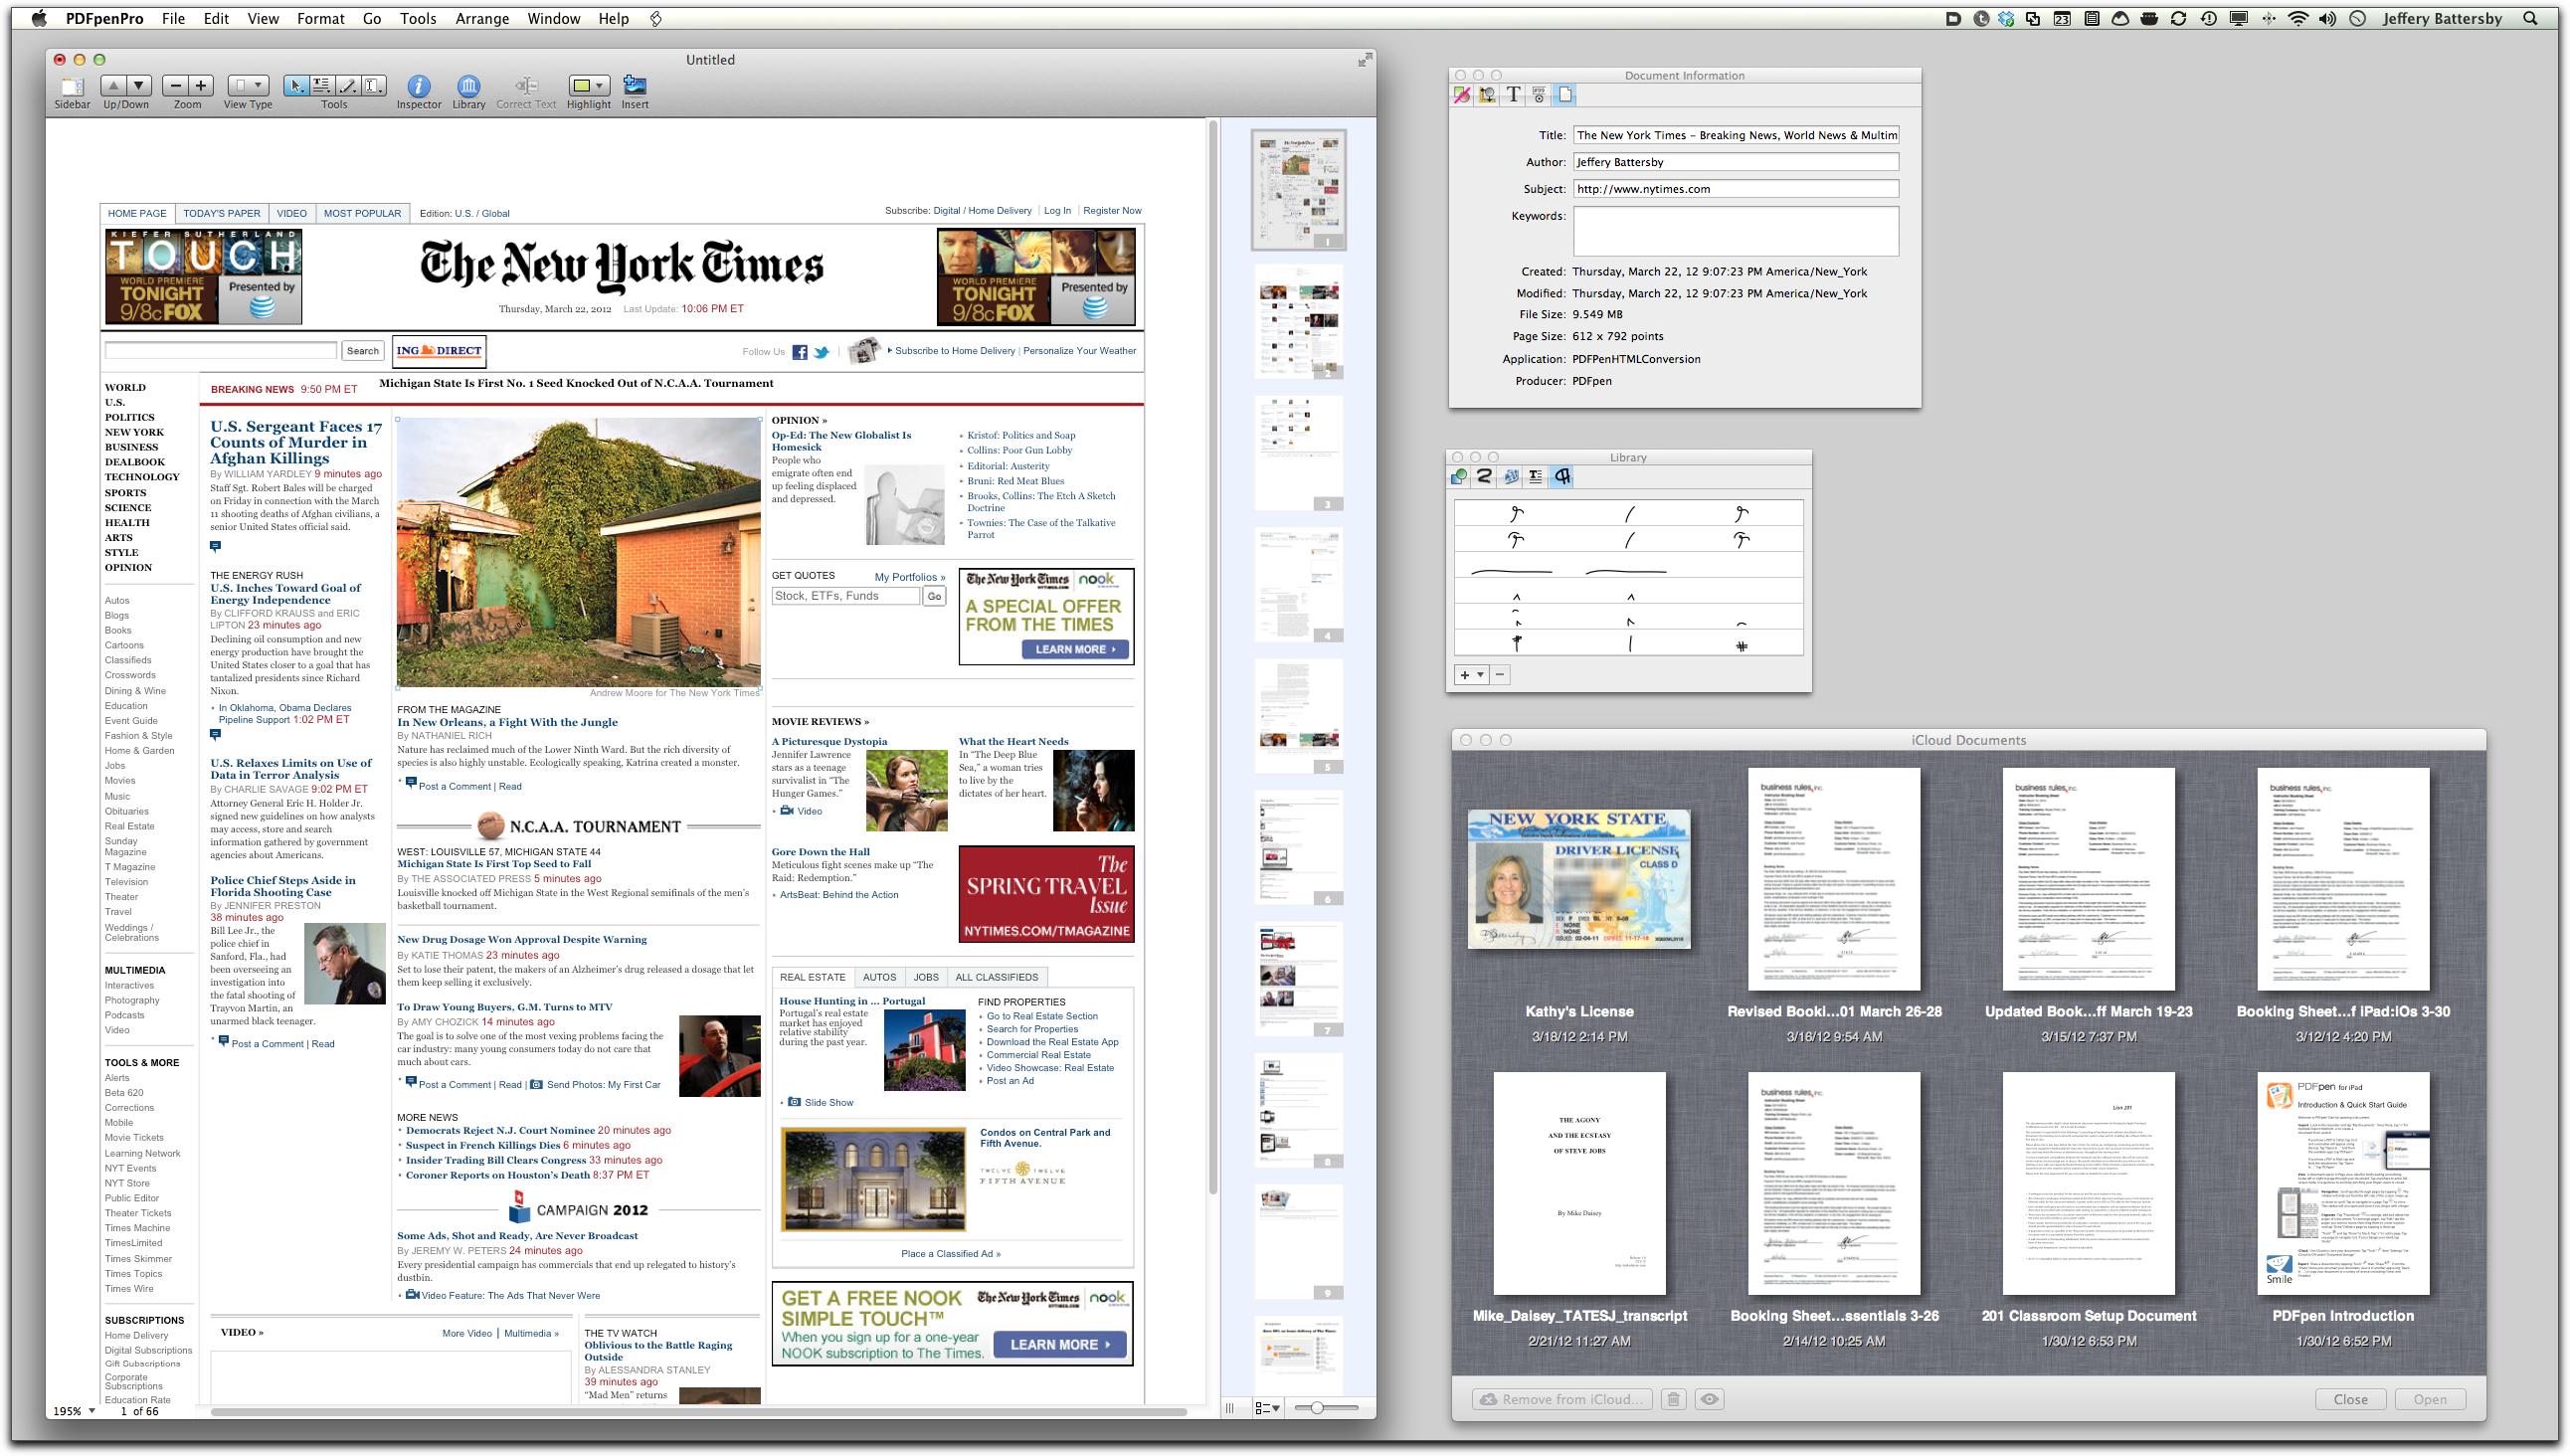 http://images.macworld.com/images/article/2012/05/pdfpenpro58-280798.png